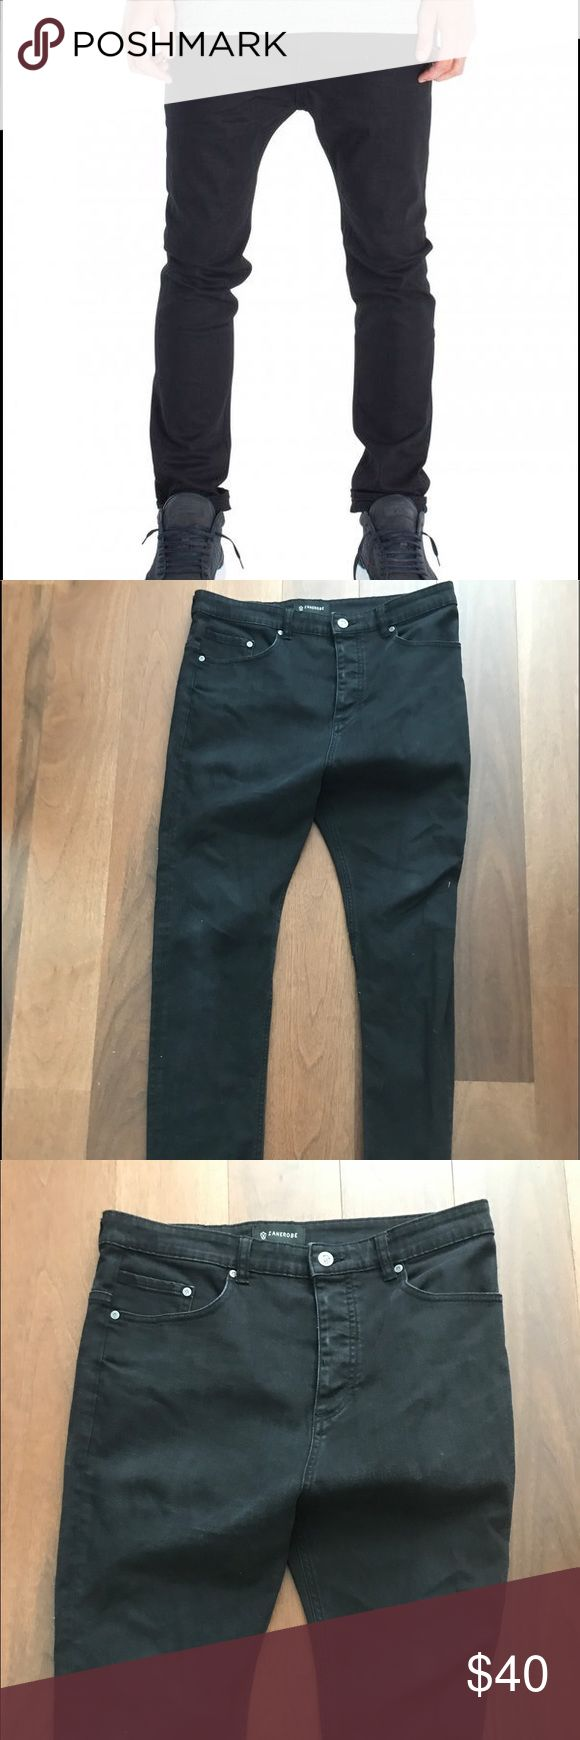 ZANEROBE low blow black drop crotch jean Sz 32 ZANEROBE low blow black drop crotch jean Sz 32 from urban outfitters Zanerobe Jeans Slim